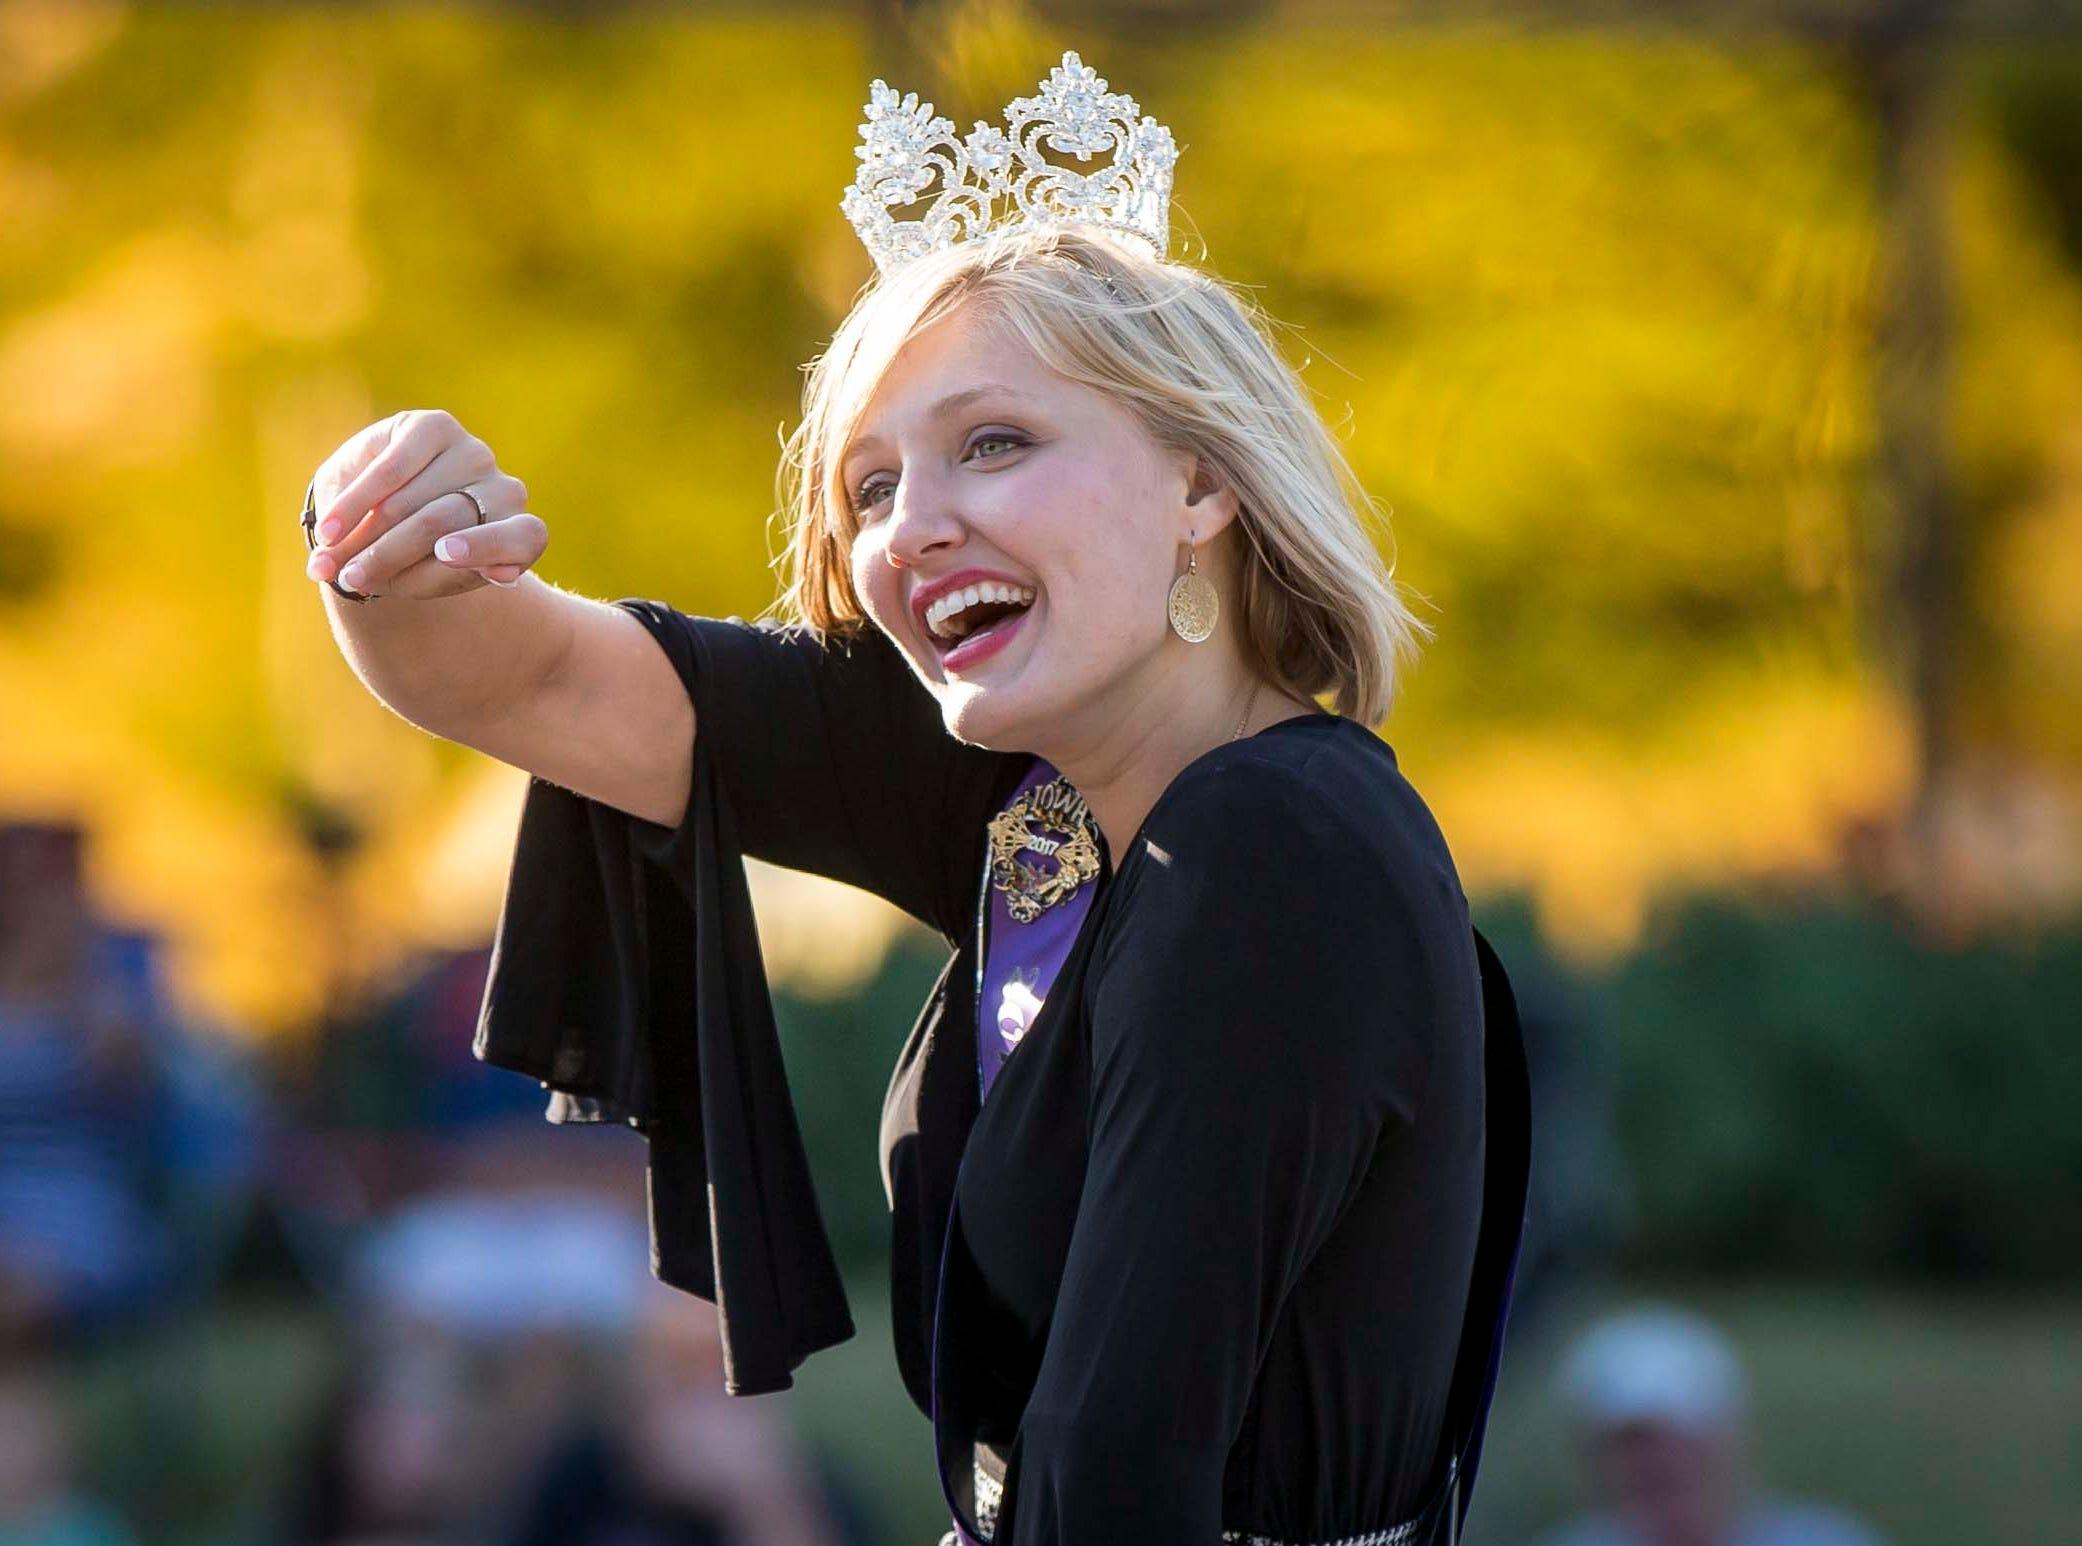 2017 Iowa State Fair Queen Jacqueline Ehrlich rides in the  2018 Iowa State Fair parade from the Statehouse to downtown Des Moines Wednesday, Aug. 8, 2018. The Iowa State Fair runs from Aug. 9Ð19.